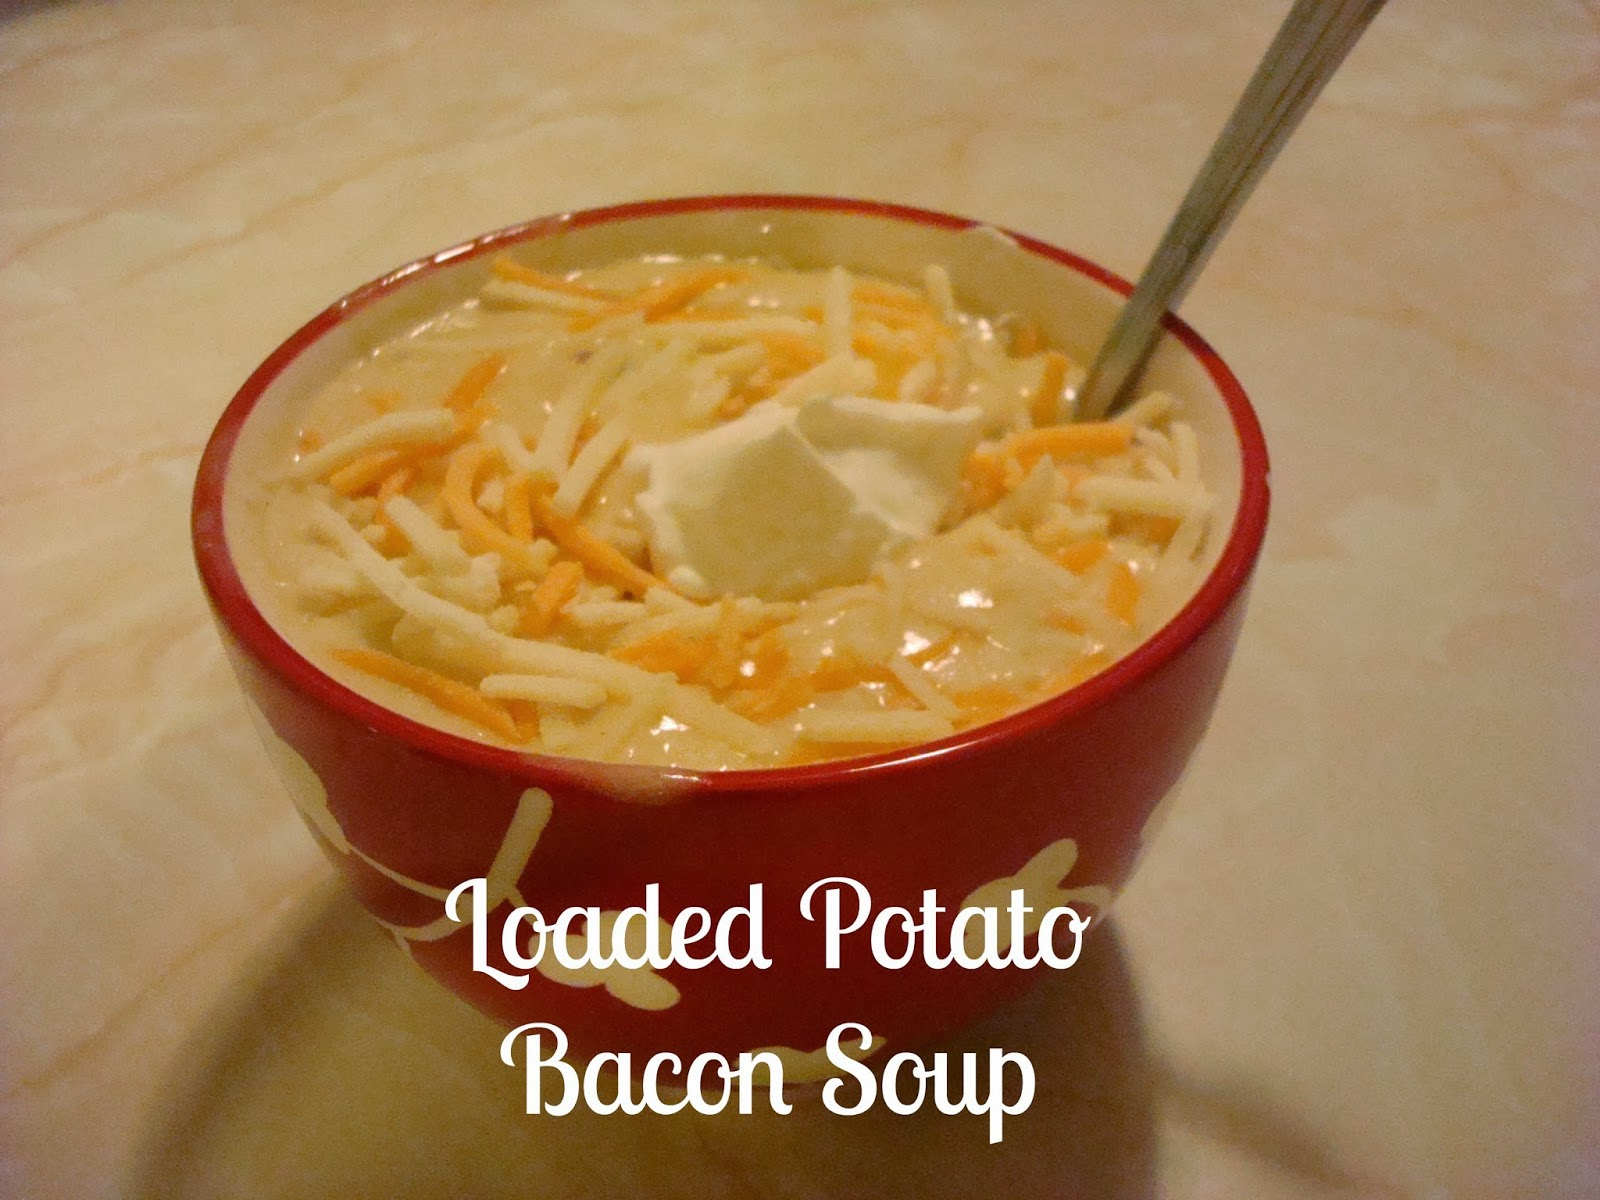 ... Chocolates and Crockpots! Come Check It Out!: Loaded Potato Bacon Soup